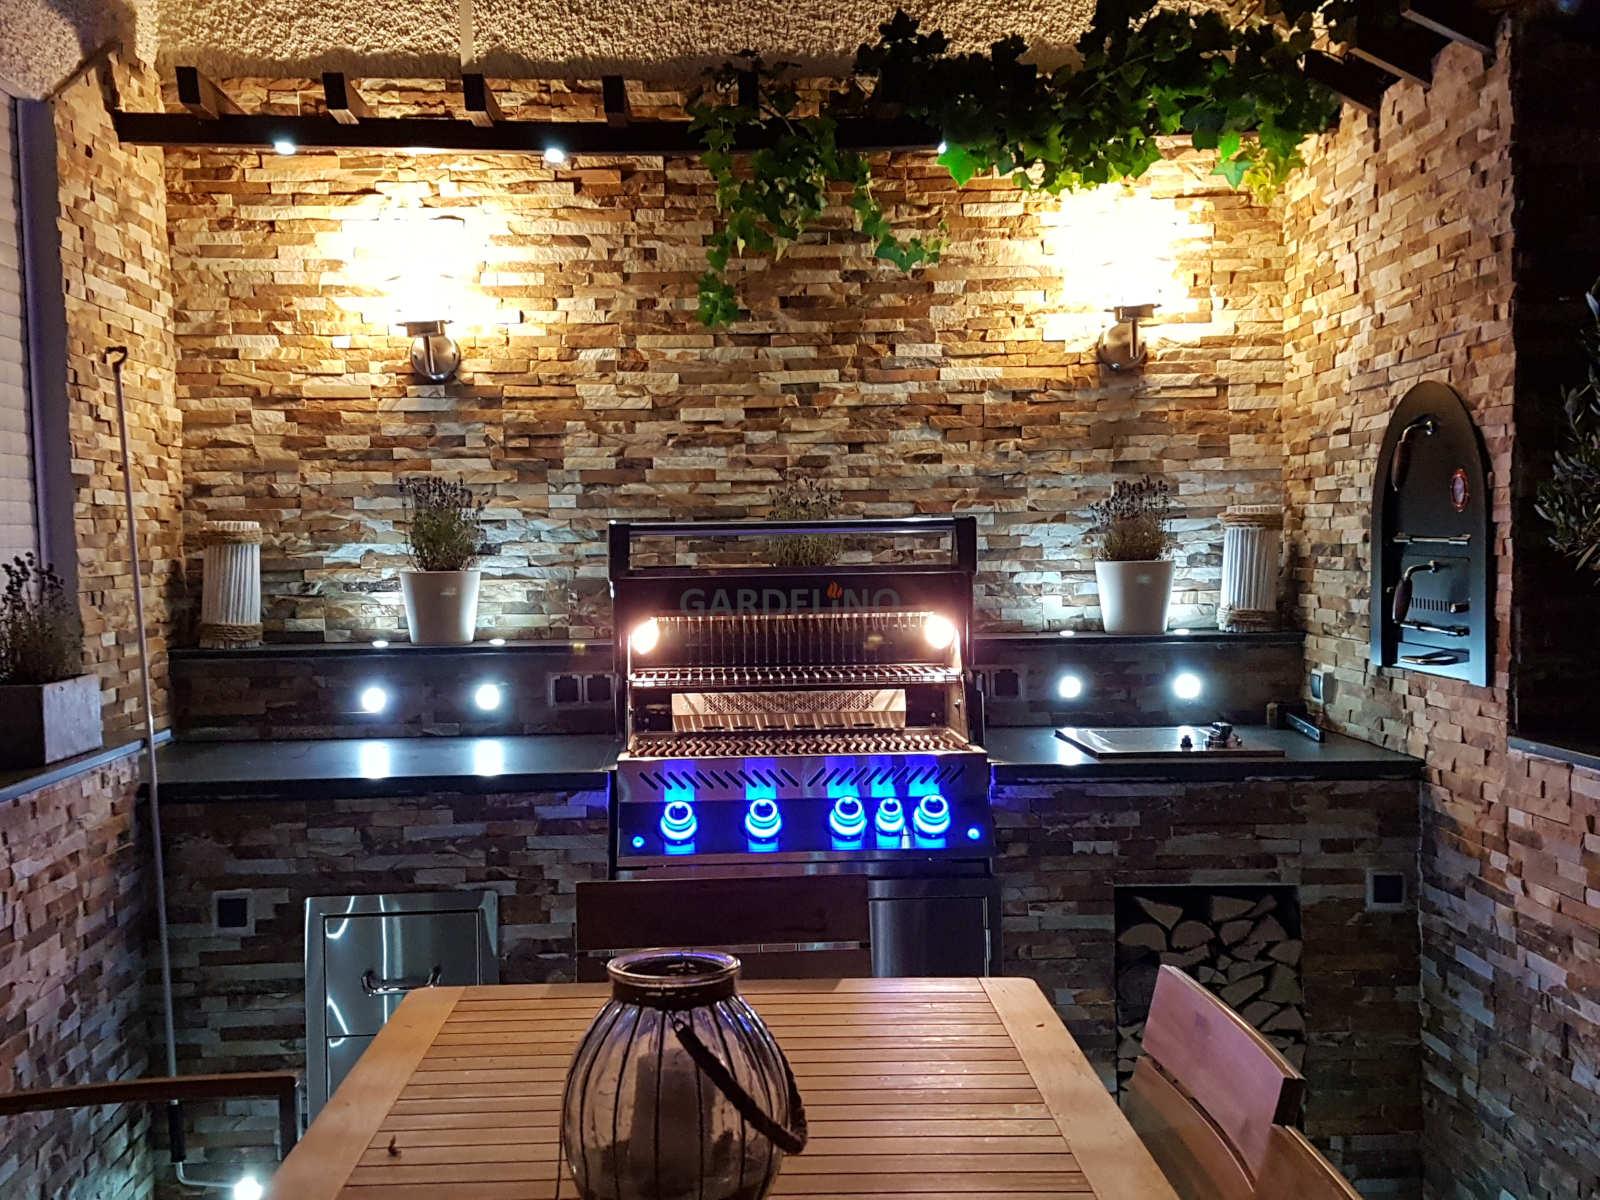 Outdoorküche Holz Xl : Outdoorküche planen tipps rund um den freiluft kochplatz mein